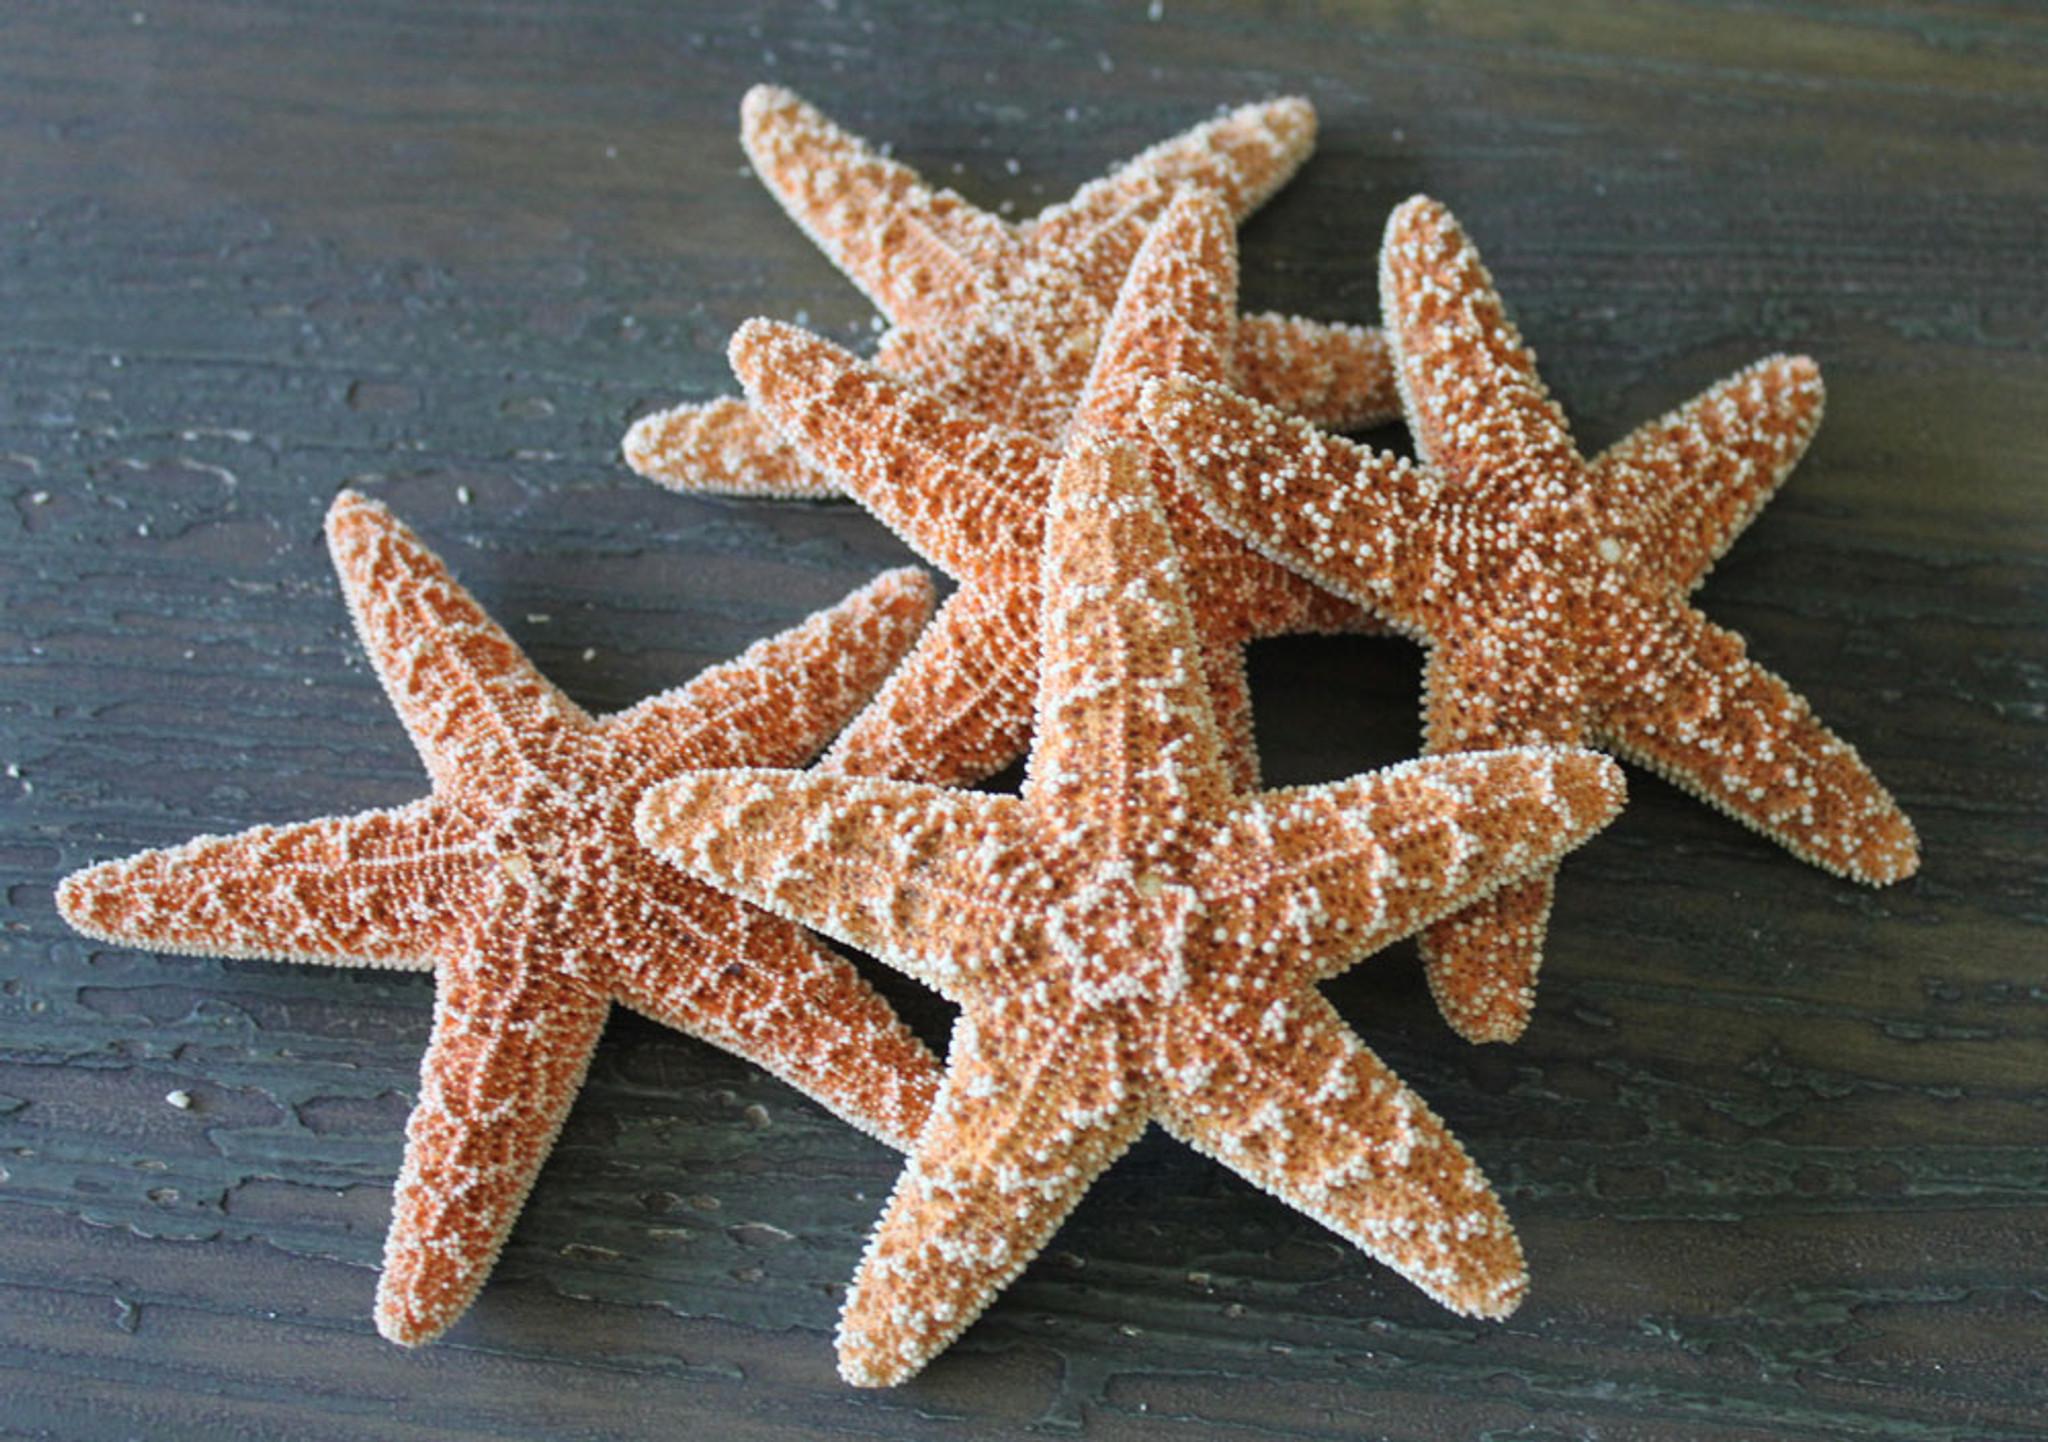 TIny 1 2 Sugar Starfish Sea Stars Natural Sealife